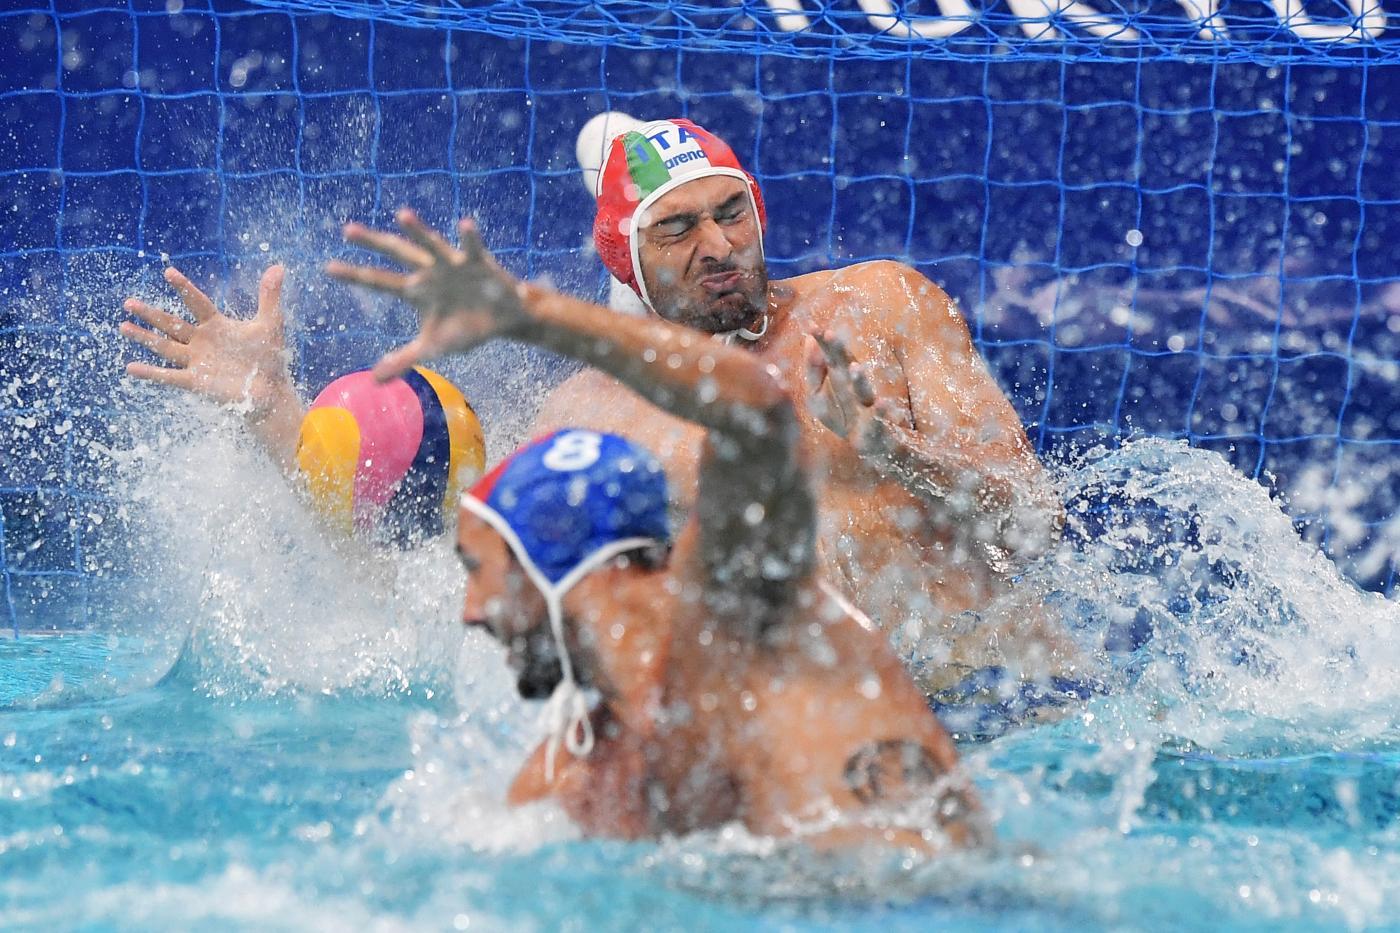 Italia Serbia oggi pallanuoto, Olimpiadi Tokyo: orario, tv, programma, streaming